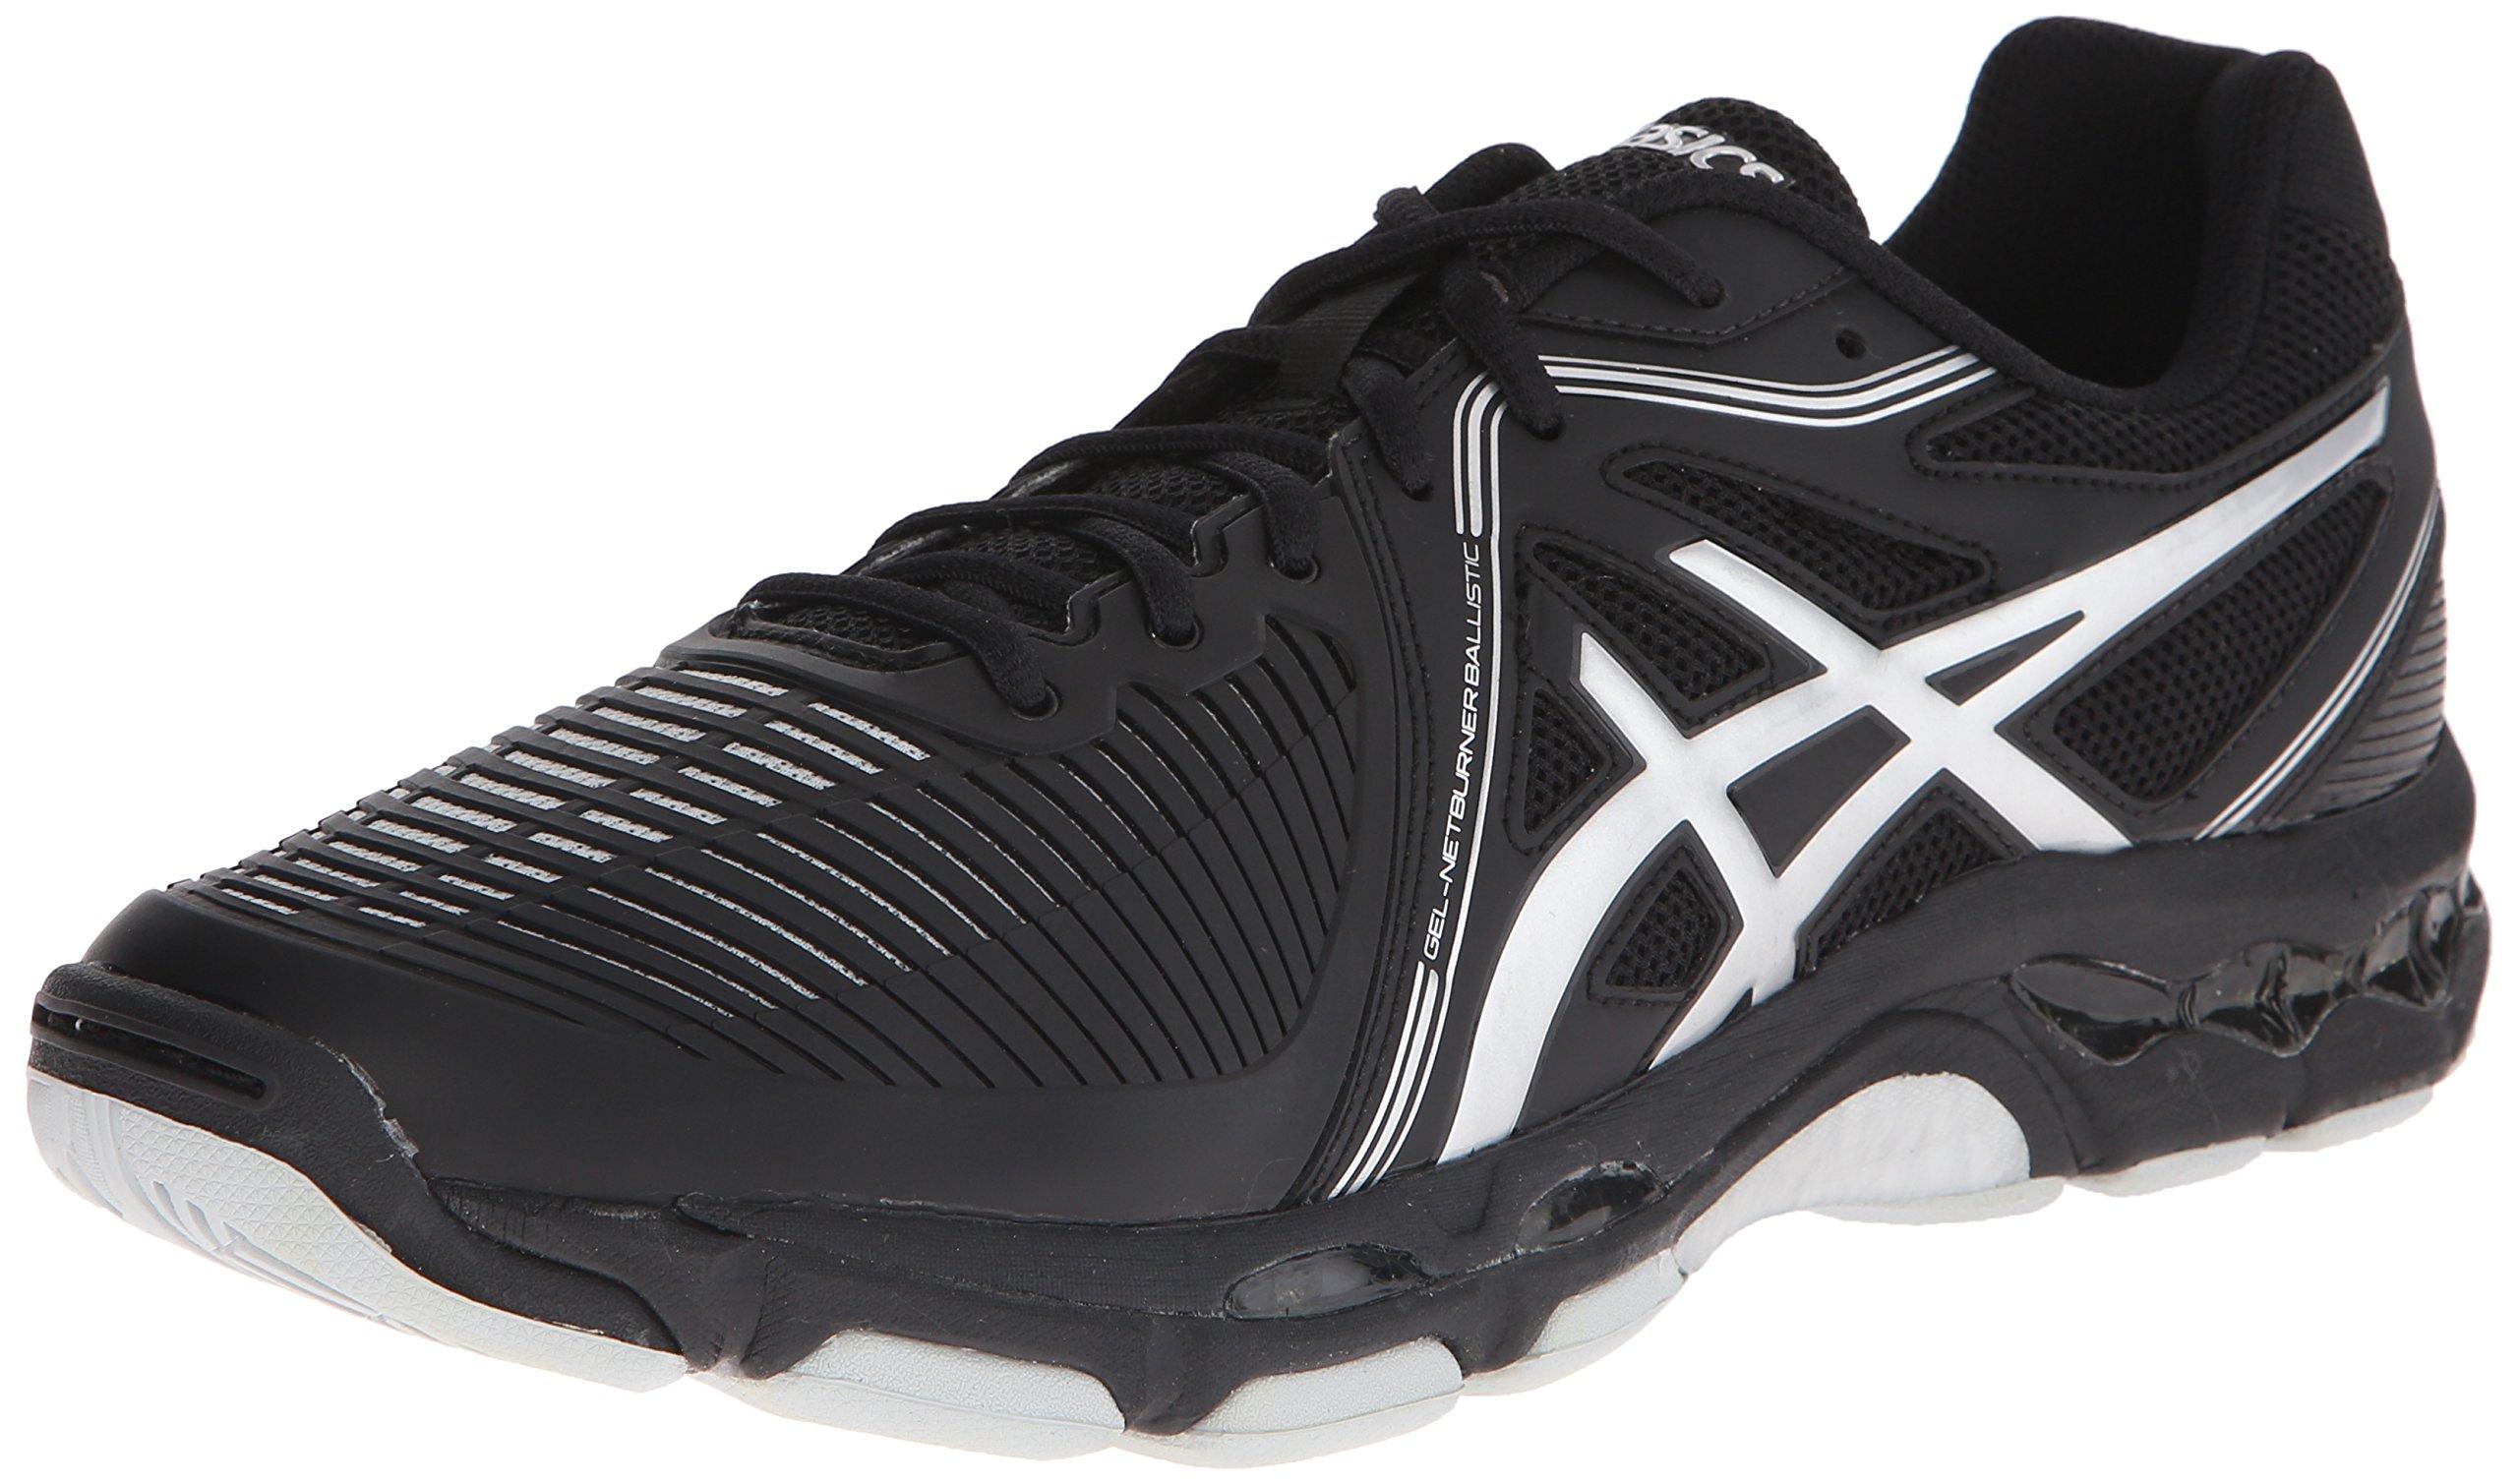 ASICS Men's Gel-Netburner Ballistic Volleyball Shoe, Black/Silver, 6.5 M US